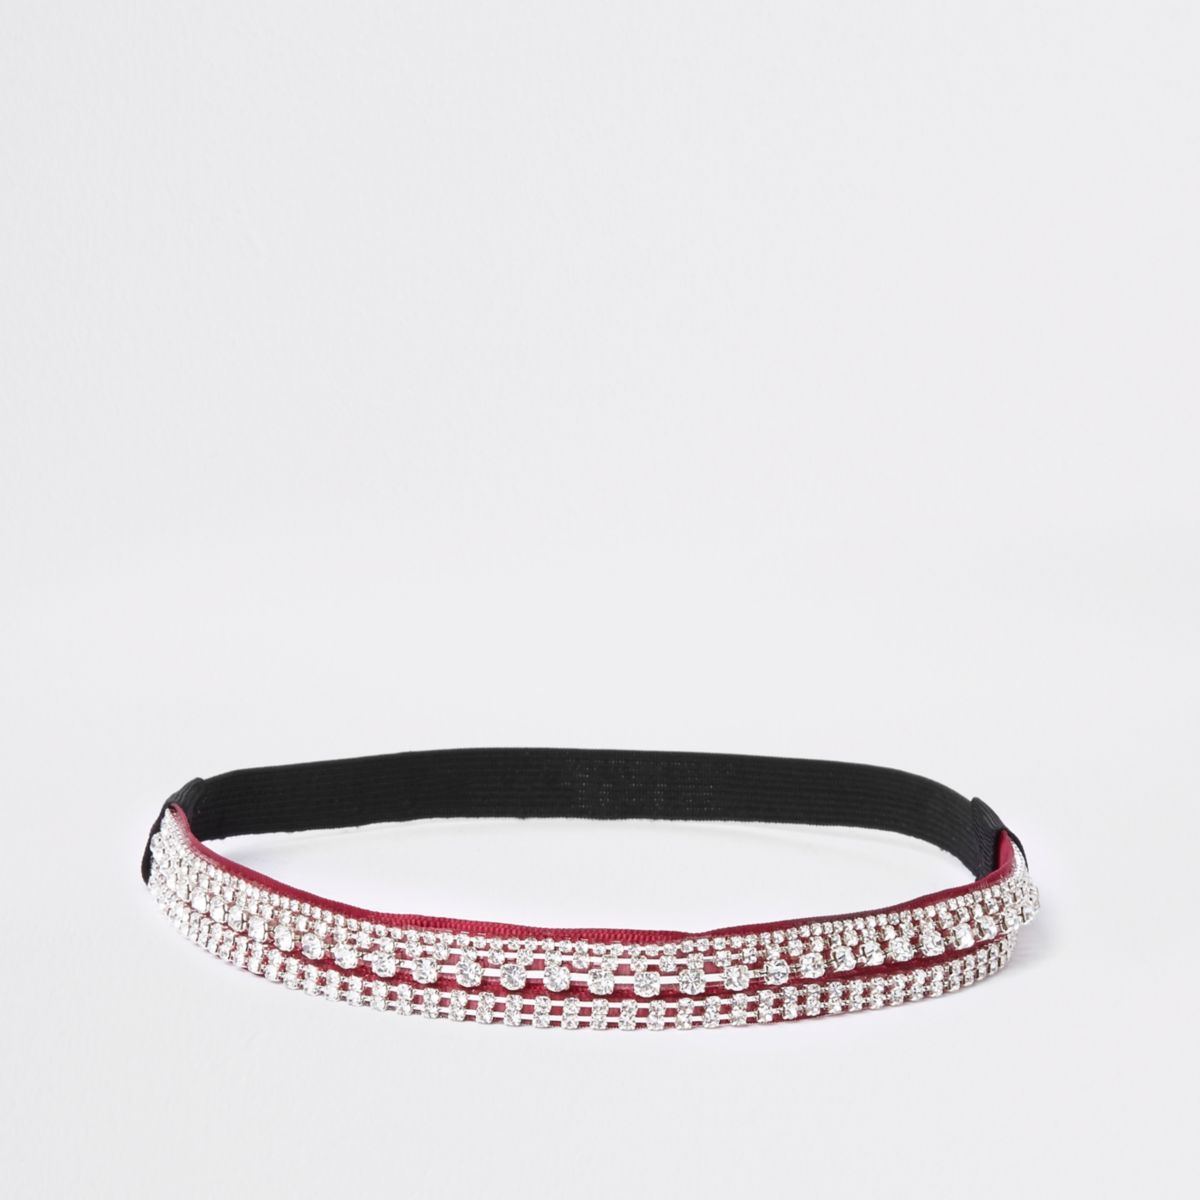 Red diamante embellished headband